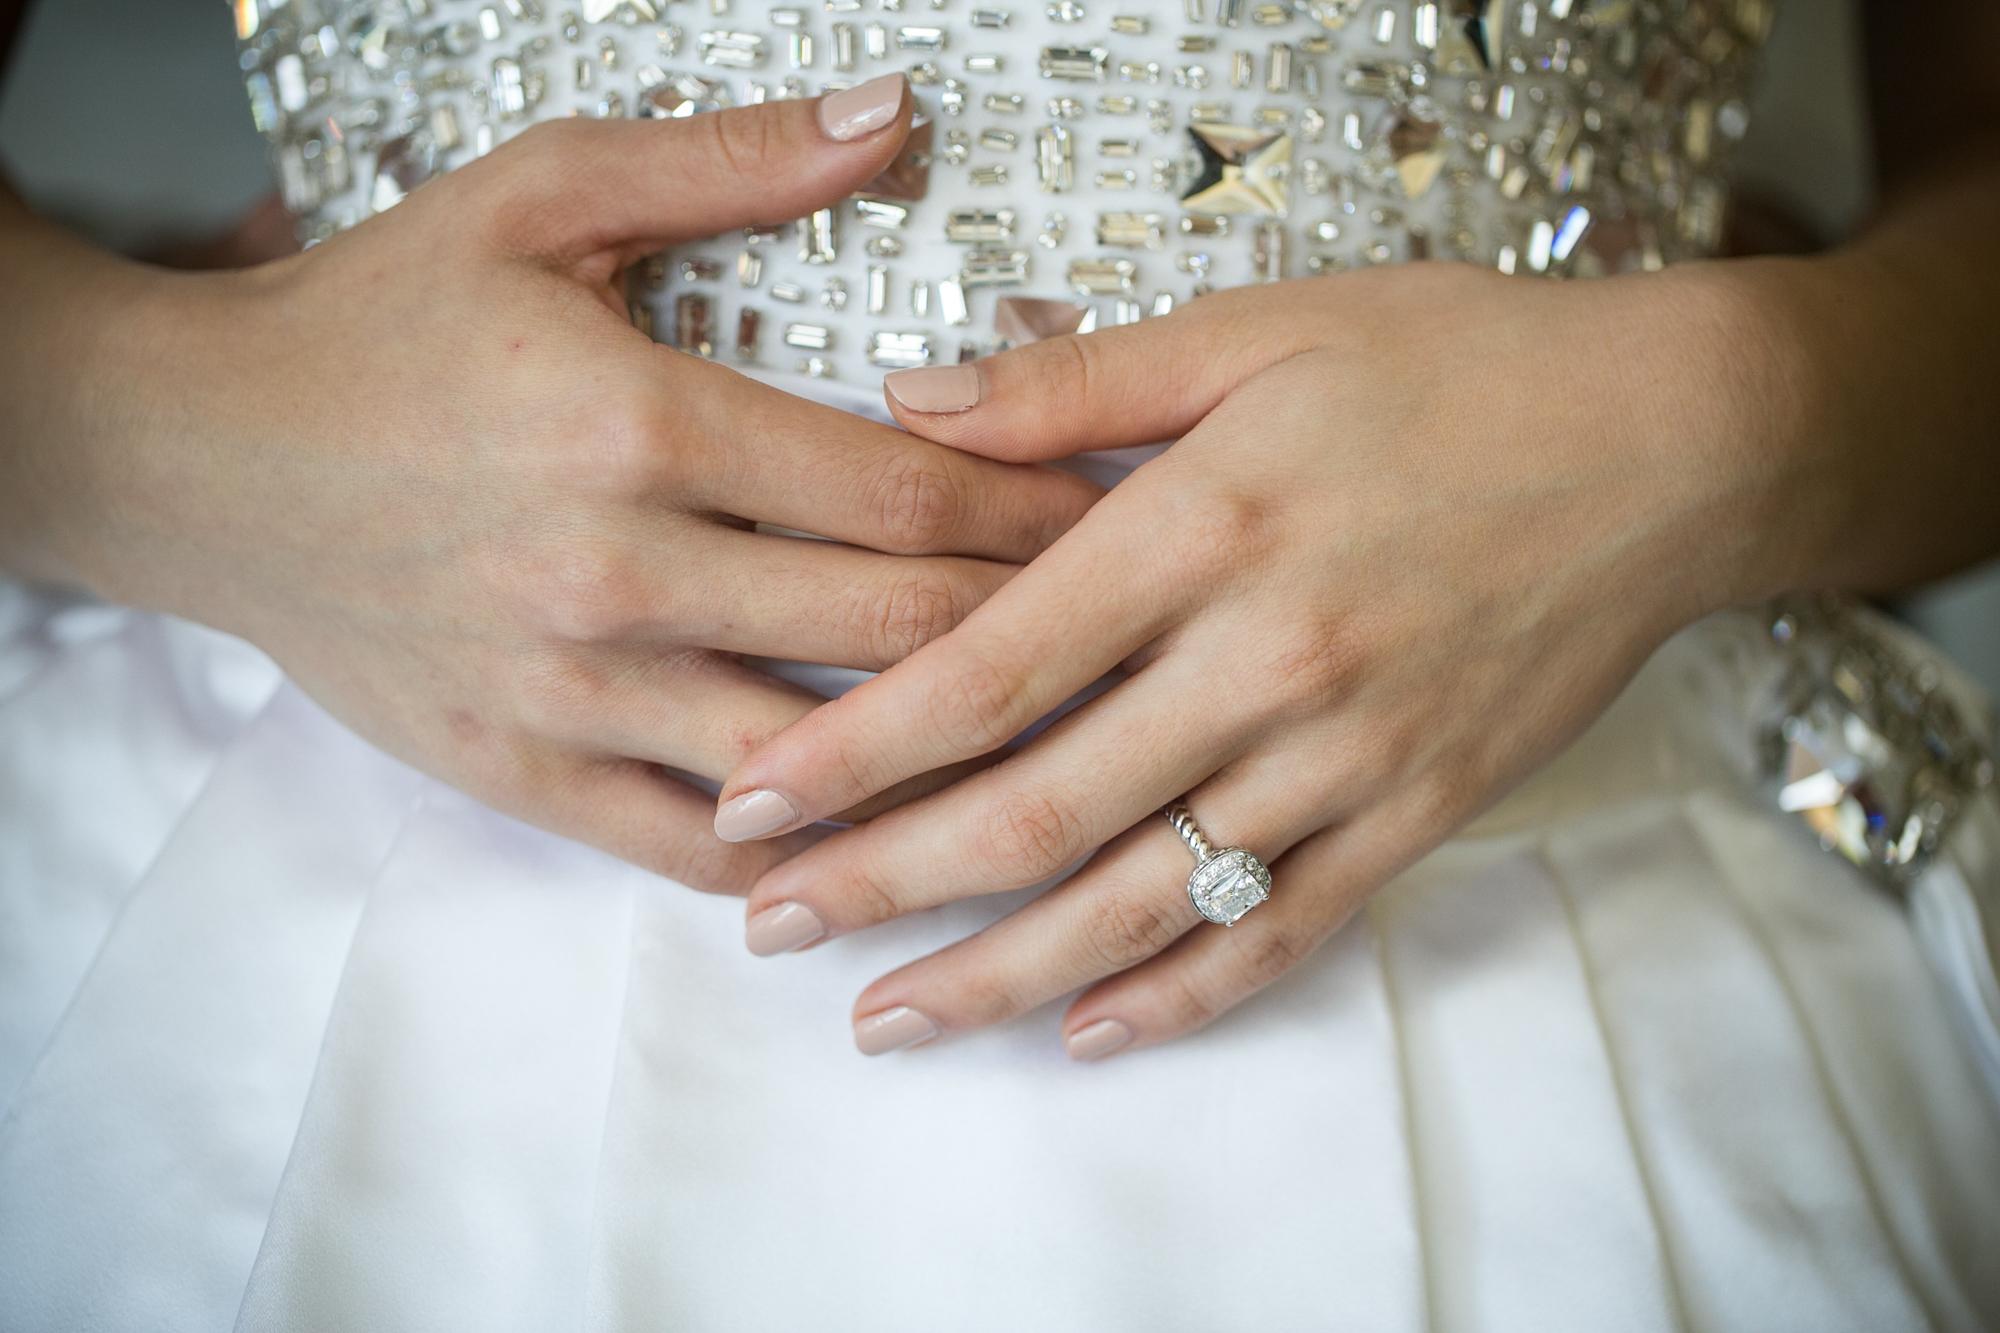 vancouver-luxury-wedding-photographer-lori-miles--4.jpg